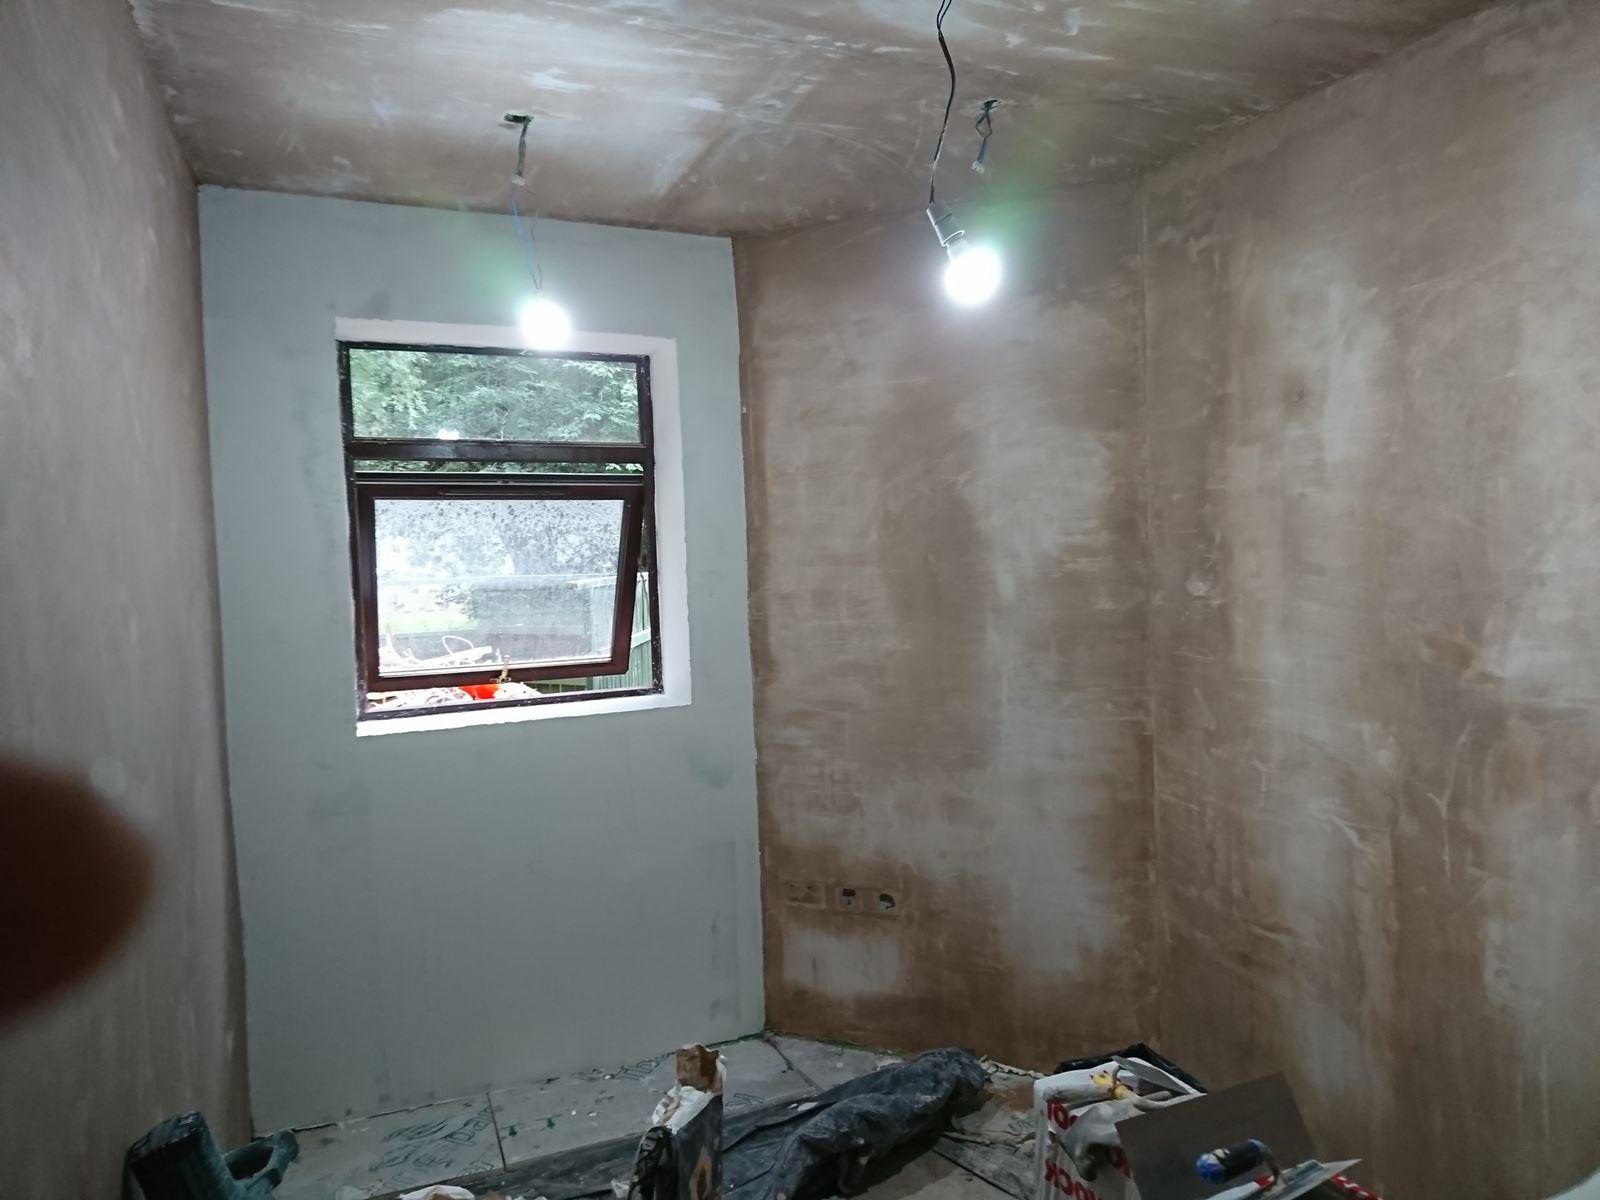 insulation-companies-edinburgh-solid-wall-insulation-edinburgh